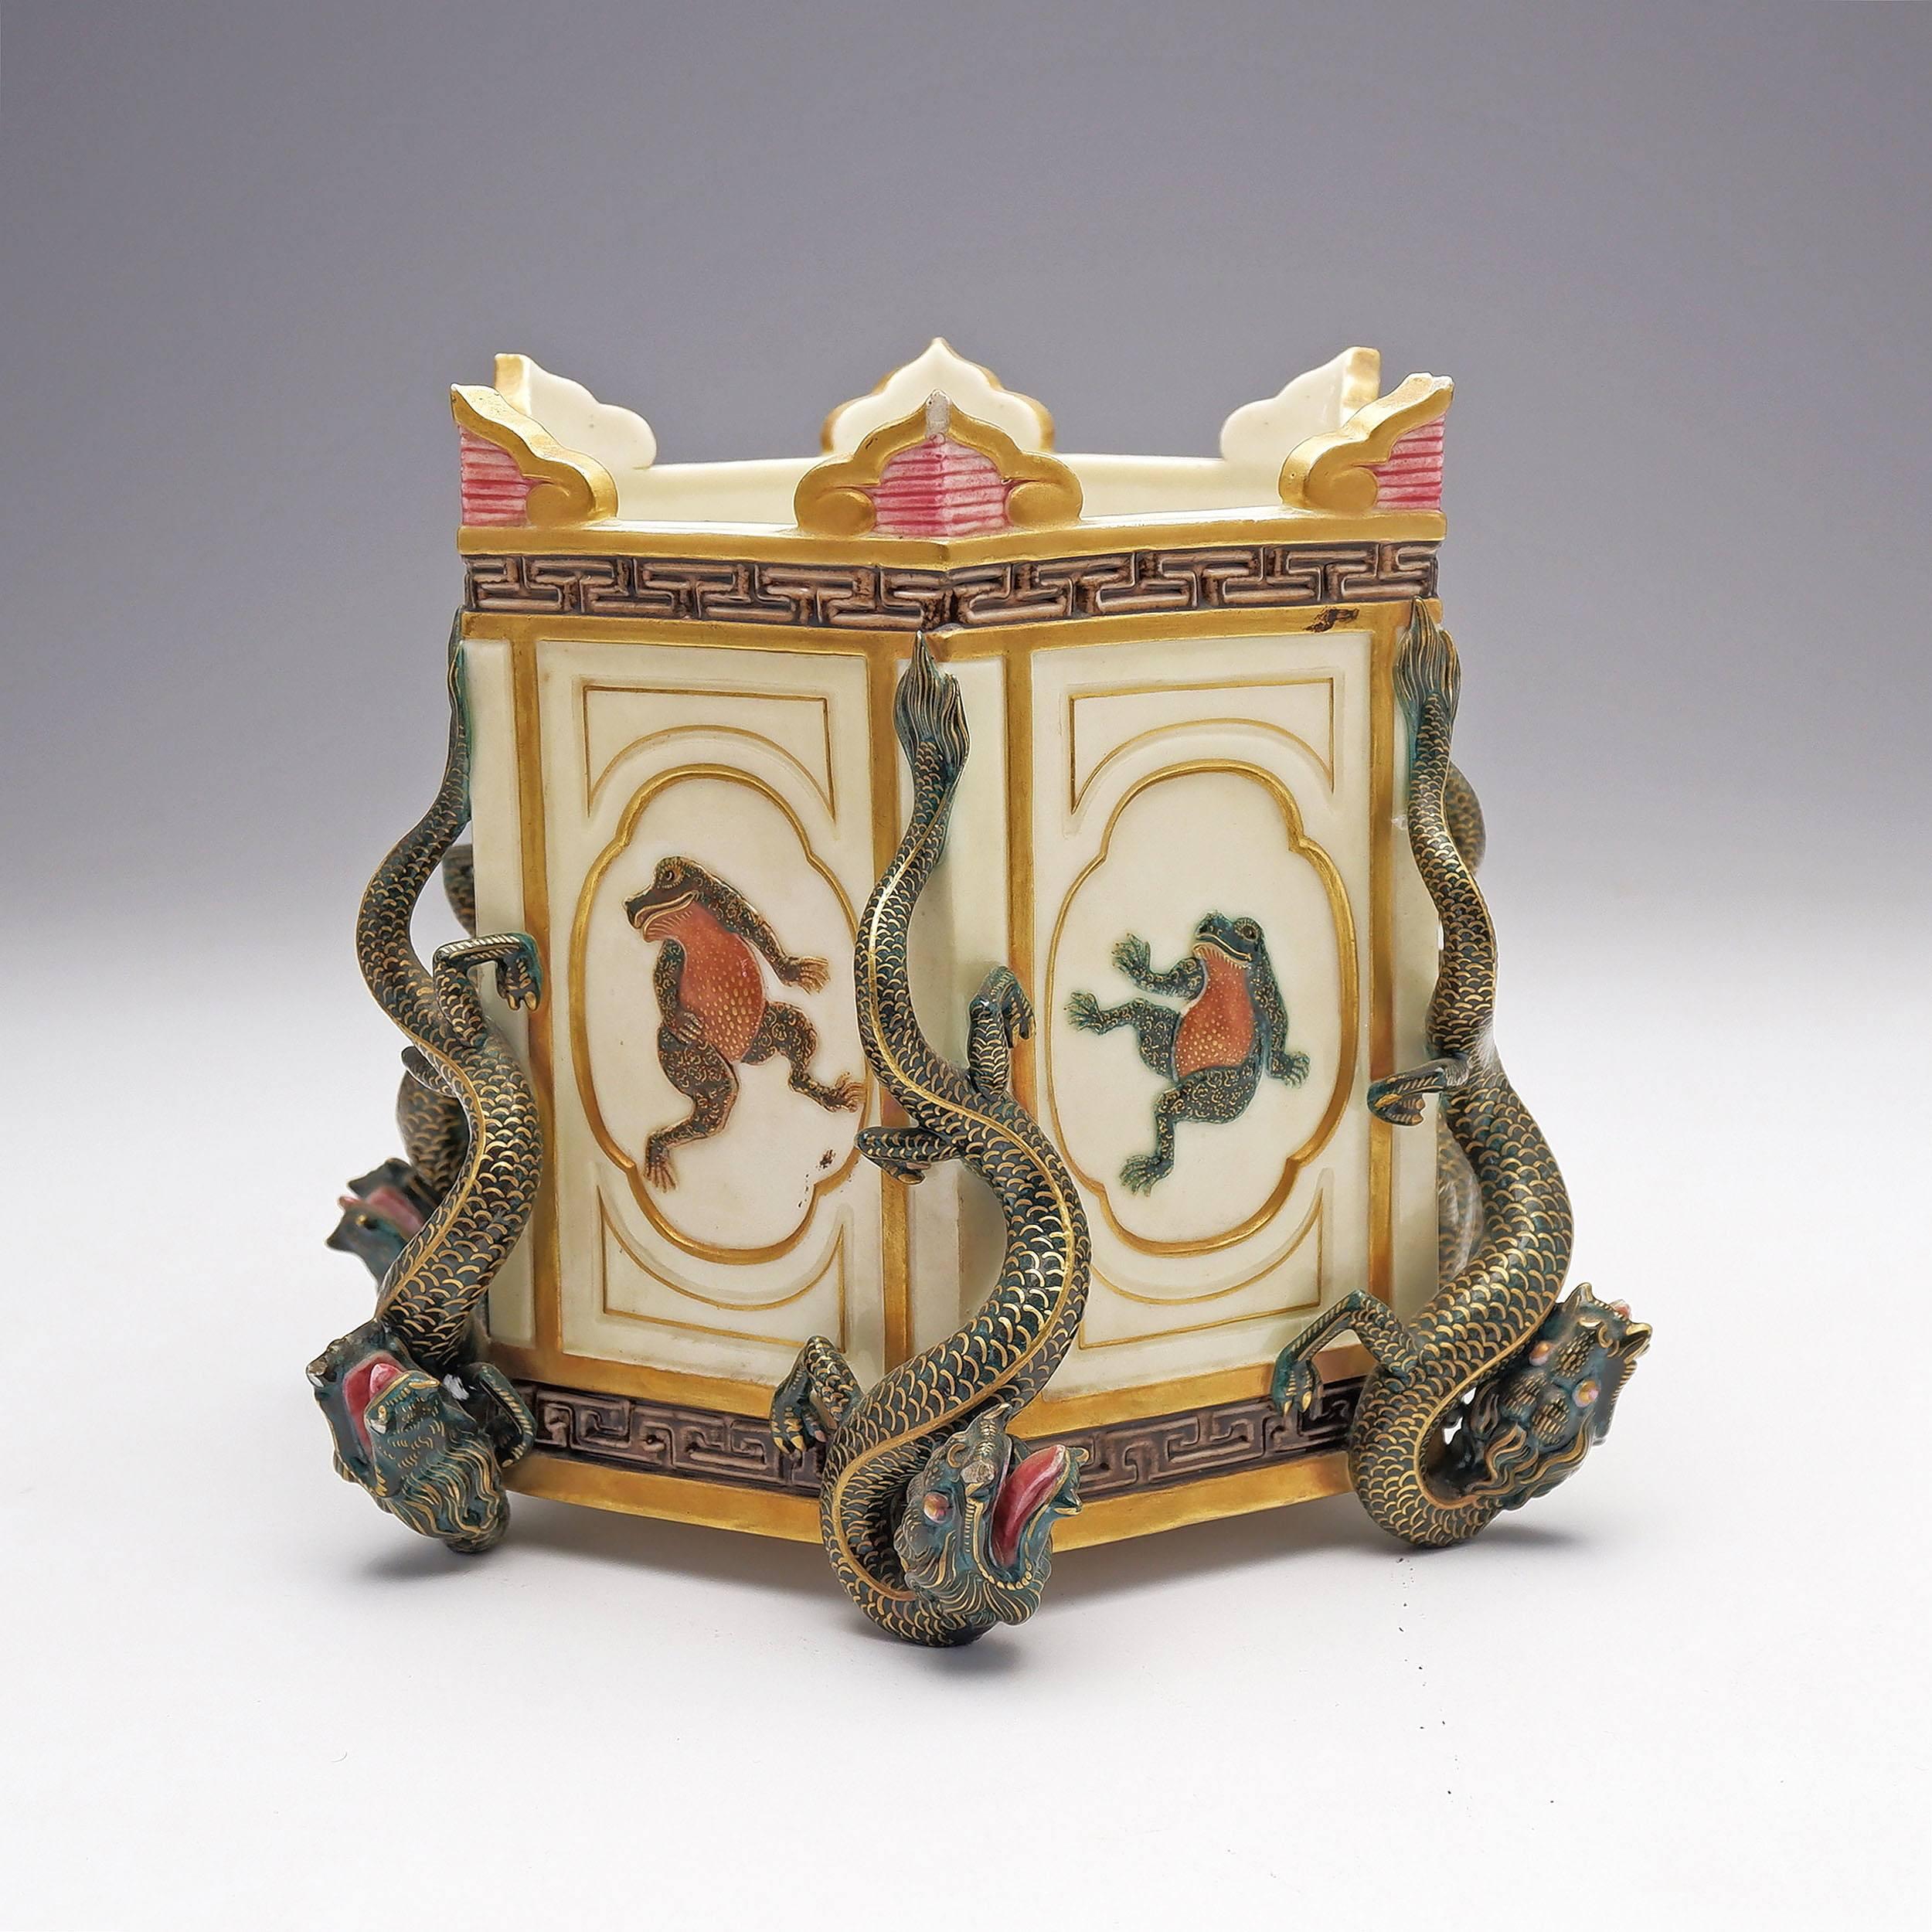 'Wonderful Royal Worcester Aesthetic Movement Porcelain Hexagonal Jardiniere, Circa 1874'